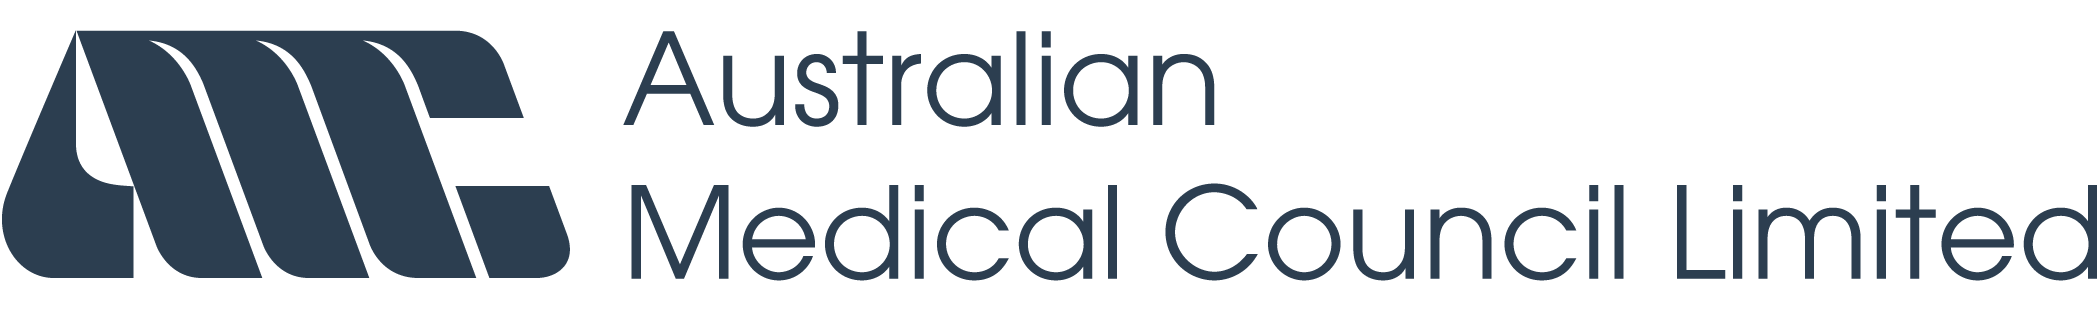 Amc logo blue